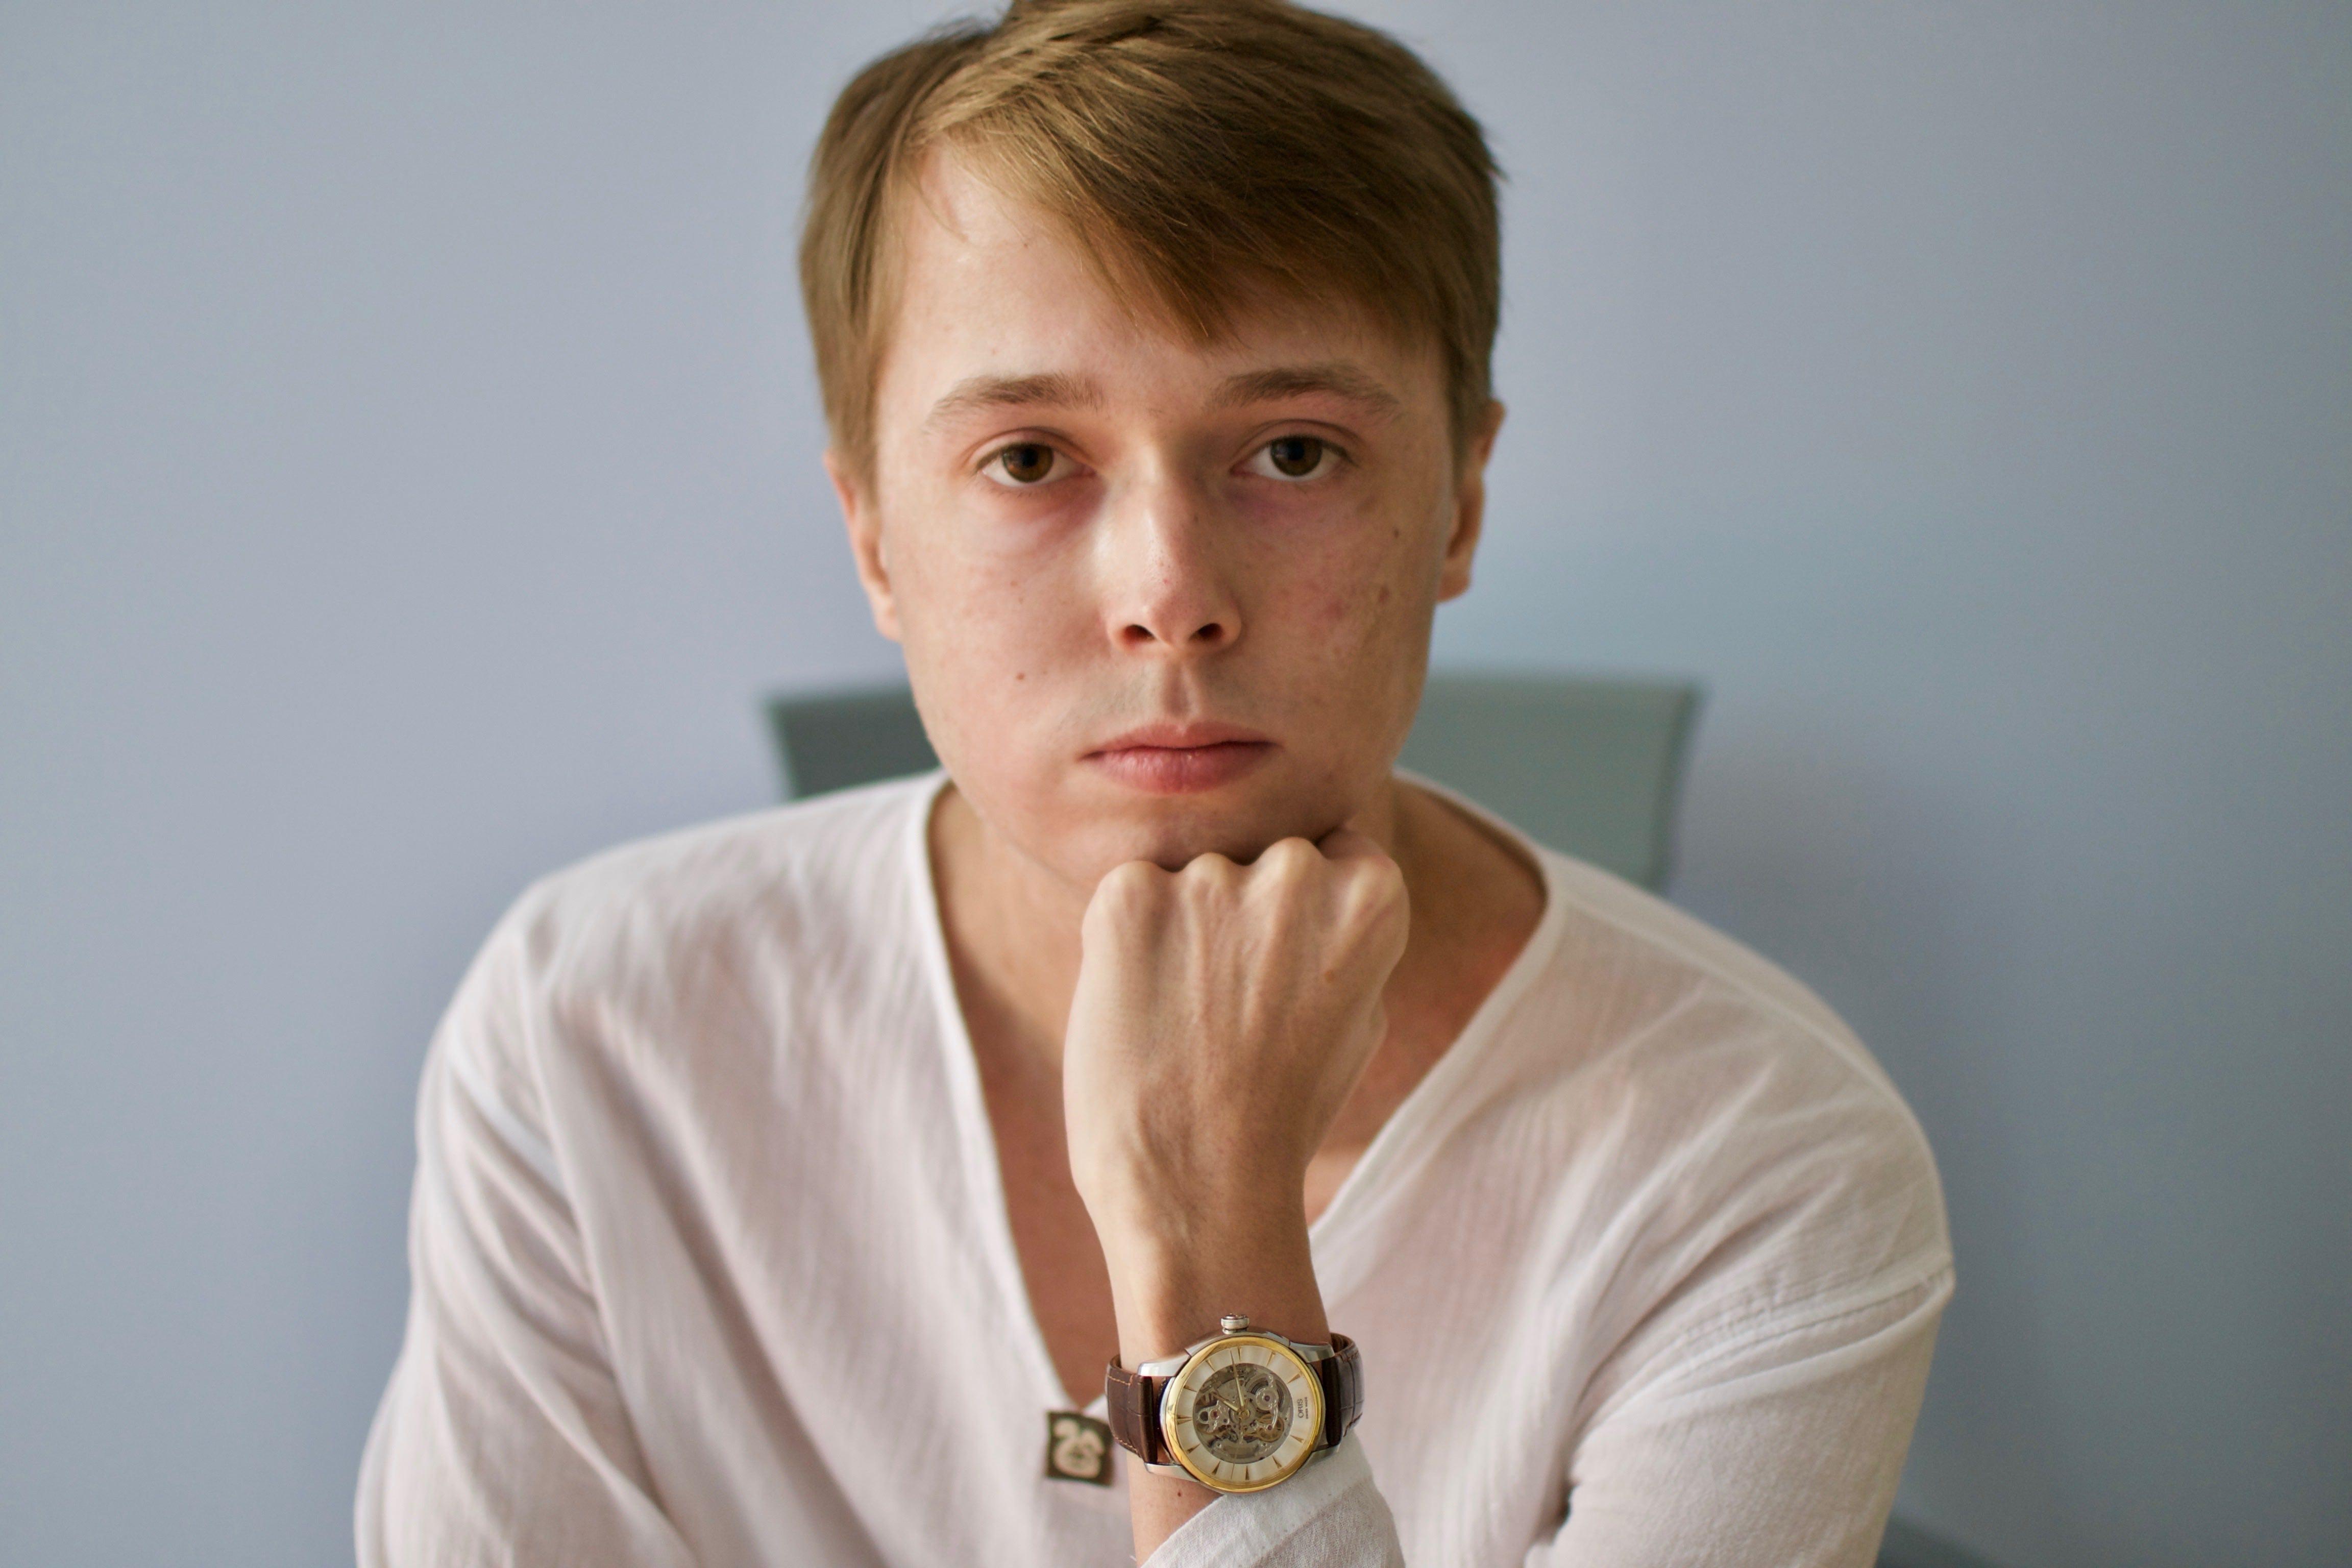 Go to Andriy Babarytskyi's profile